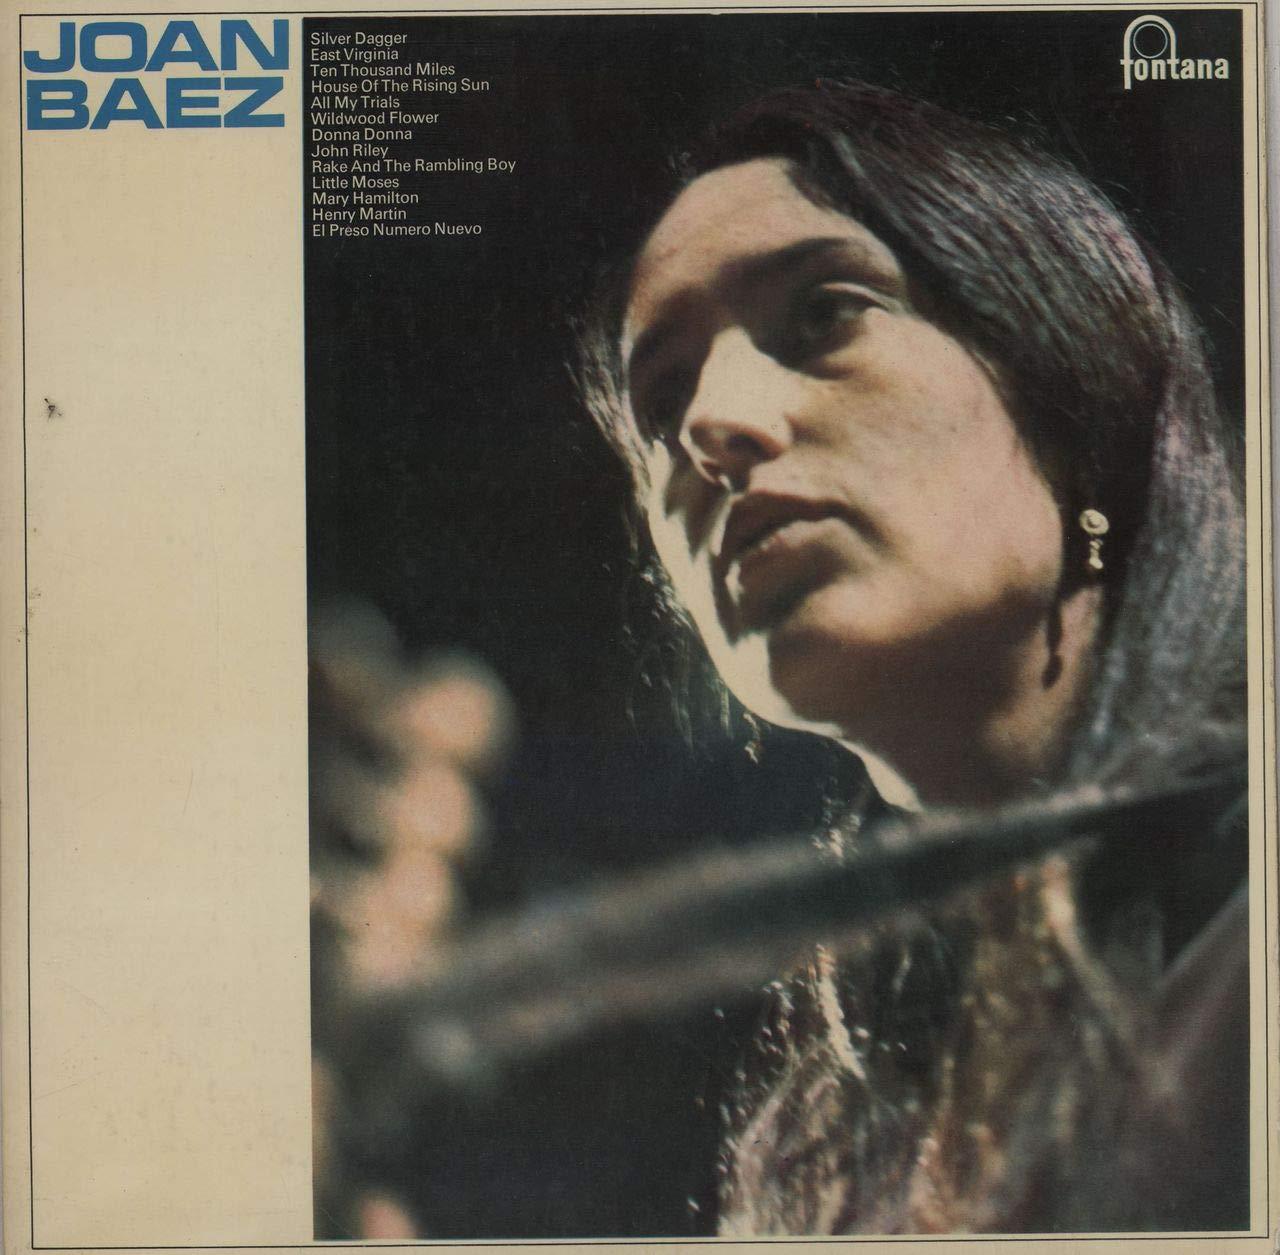 Joan Baez Photos (34 of 99) — Last.fm